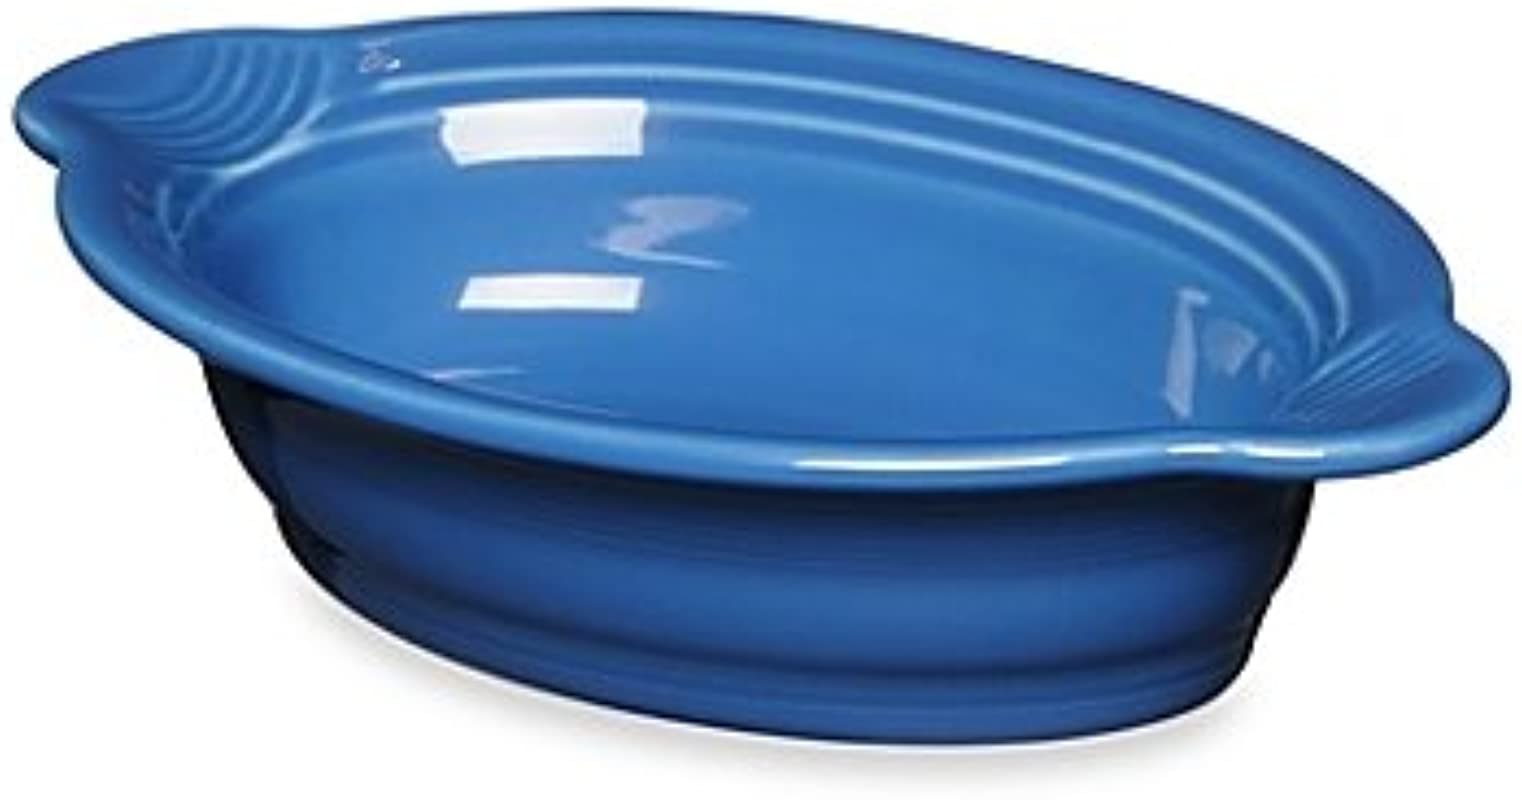 Fiesta 17 Oz Oval Individual Casserole Dish In Lapis